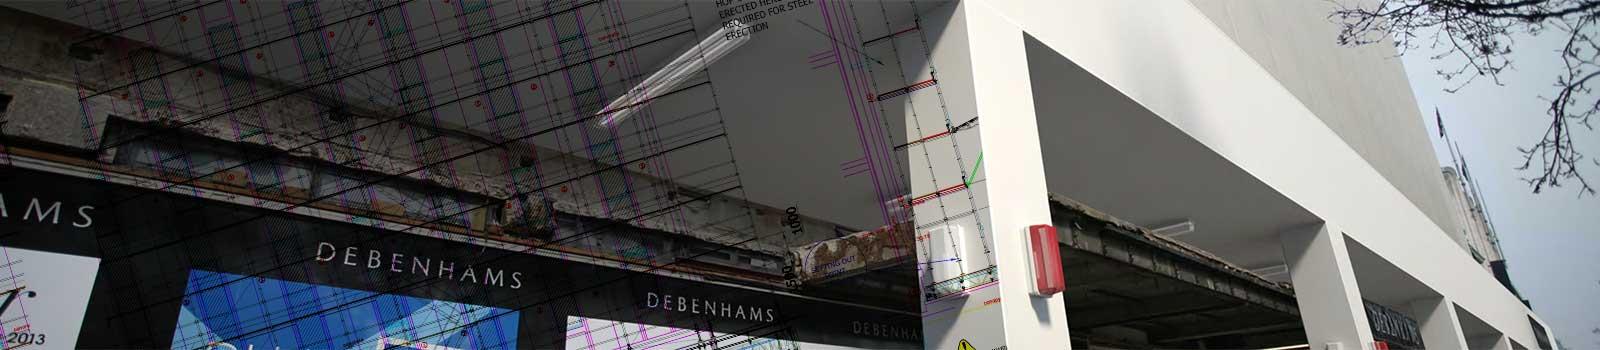 Slider-3D-Debenhams-Overlay2D-1600